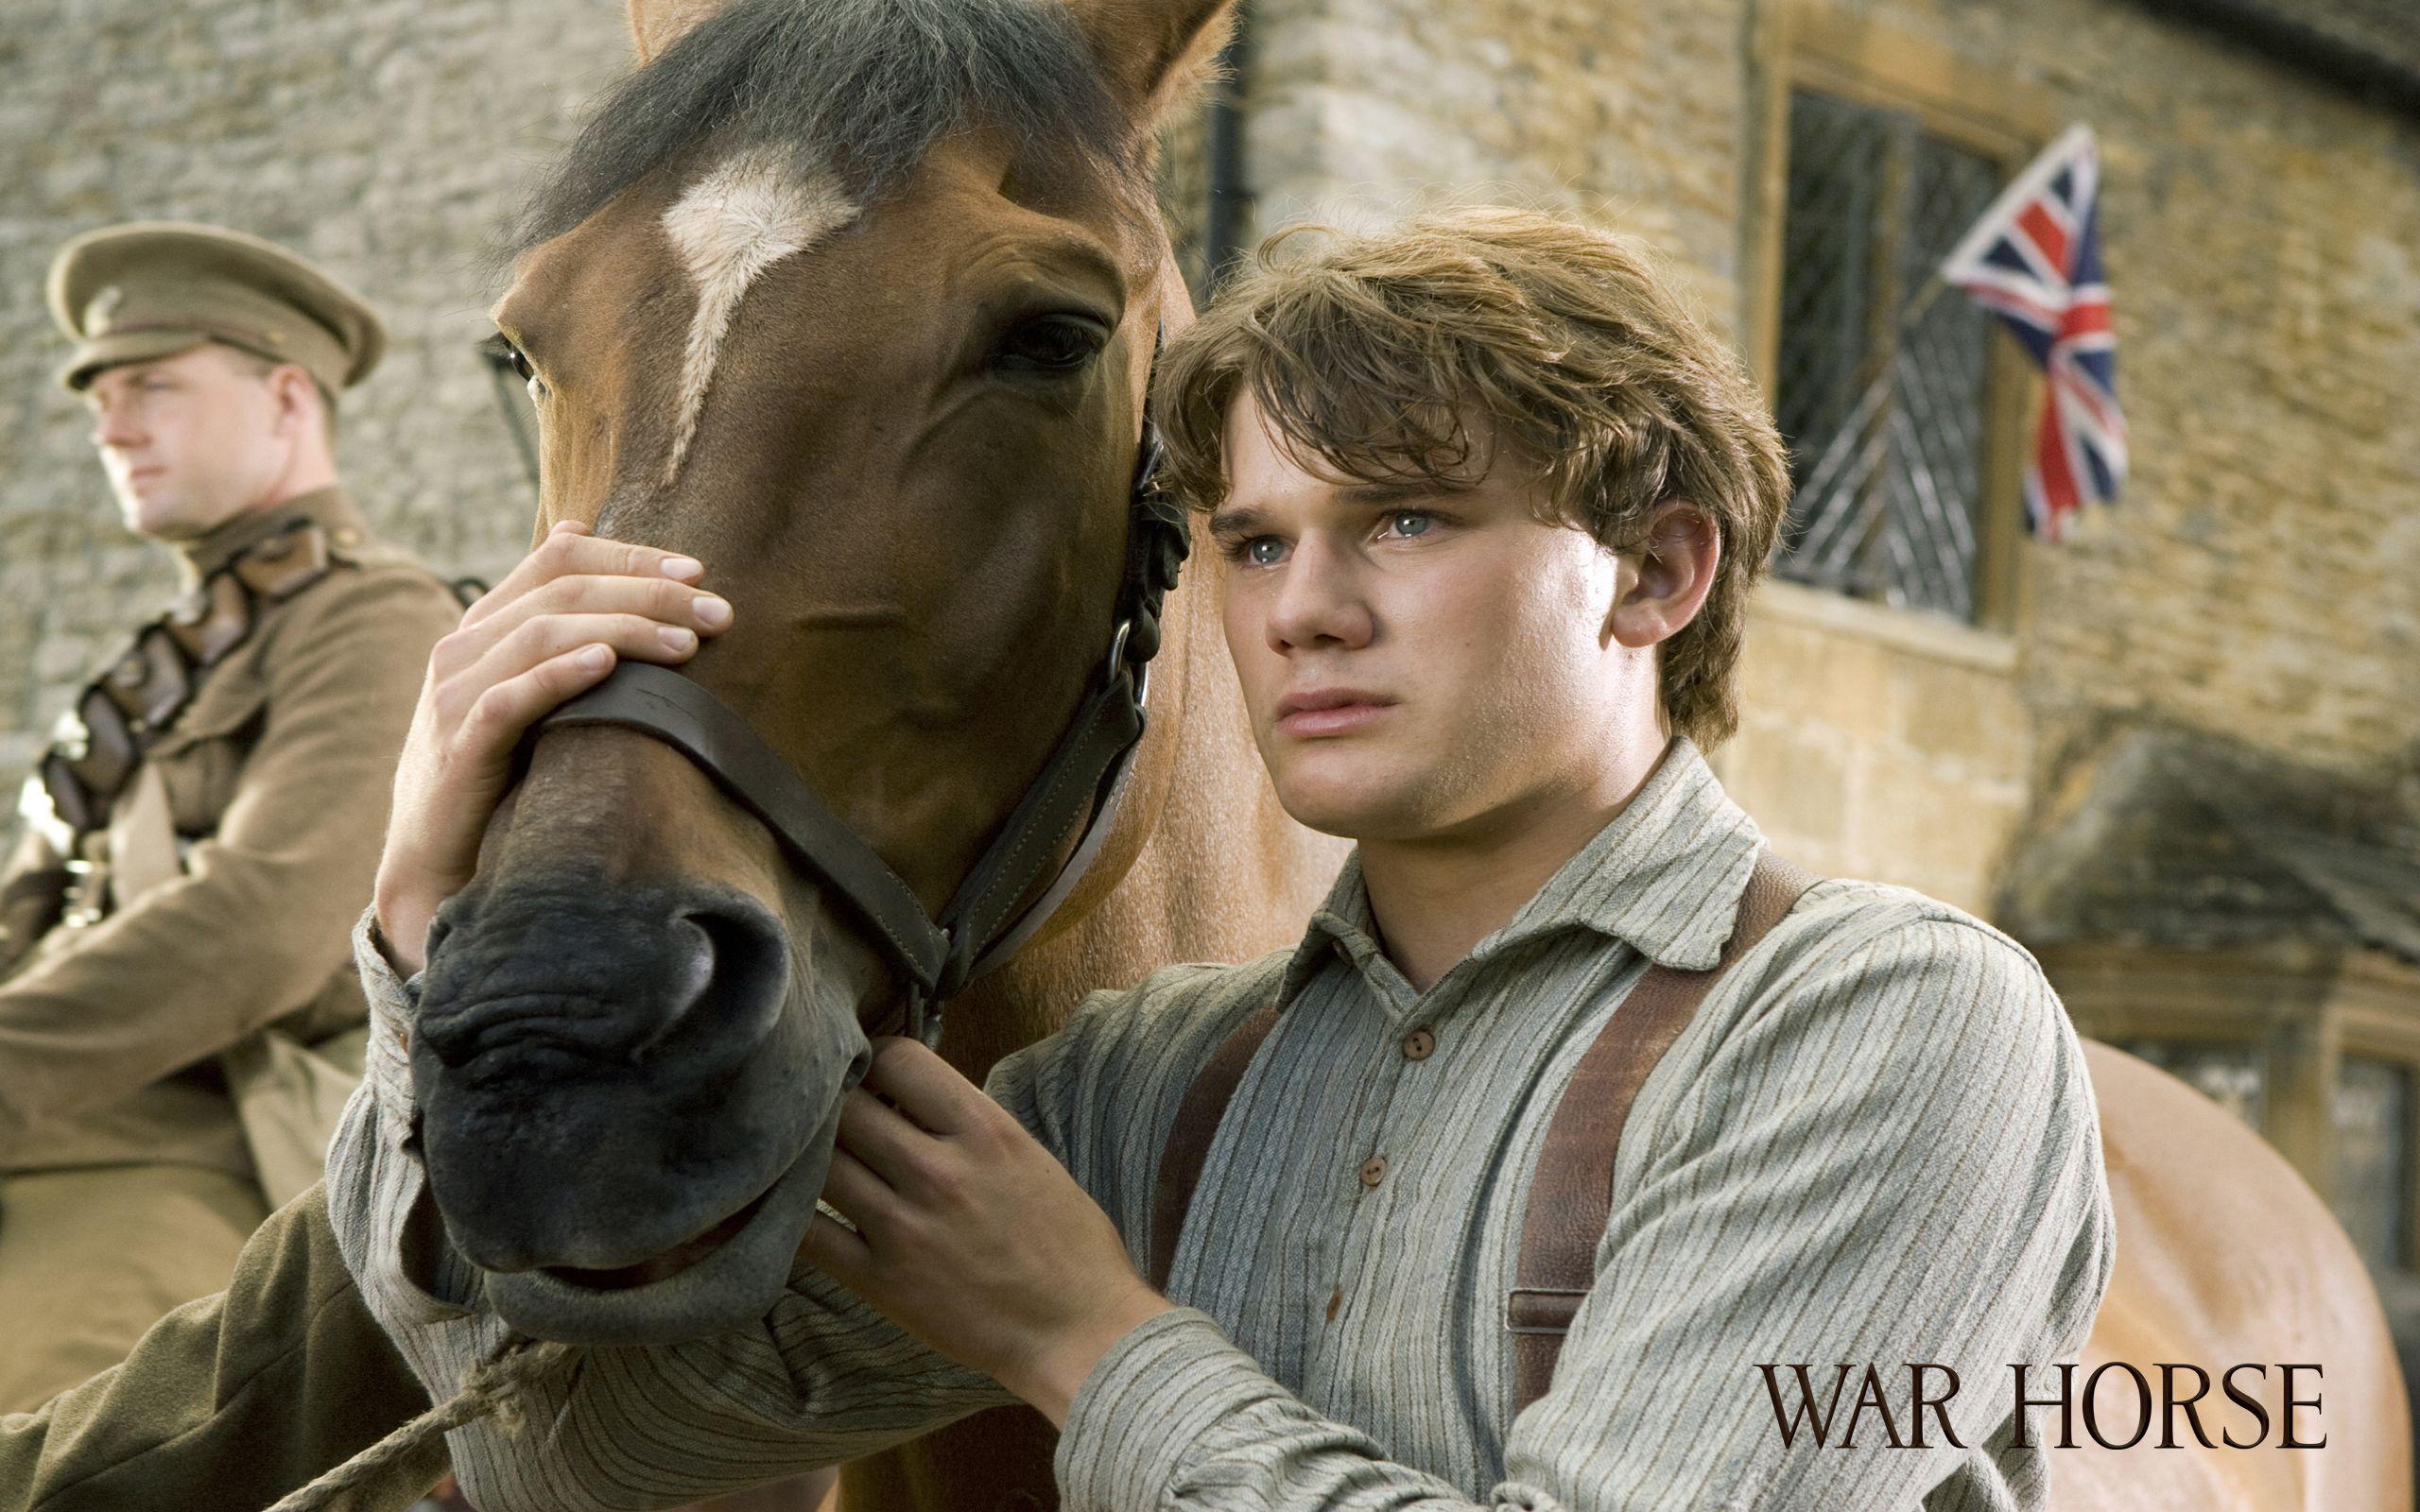 War Horse Is A 2011 Epic War Film Adaptation Of War Horse A 1982 Children S Novel Set Before And During World War I By Horse Movies War Horse Movie War Horse